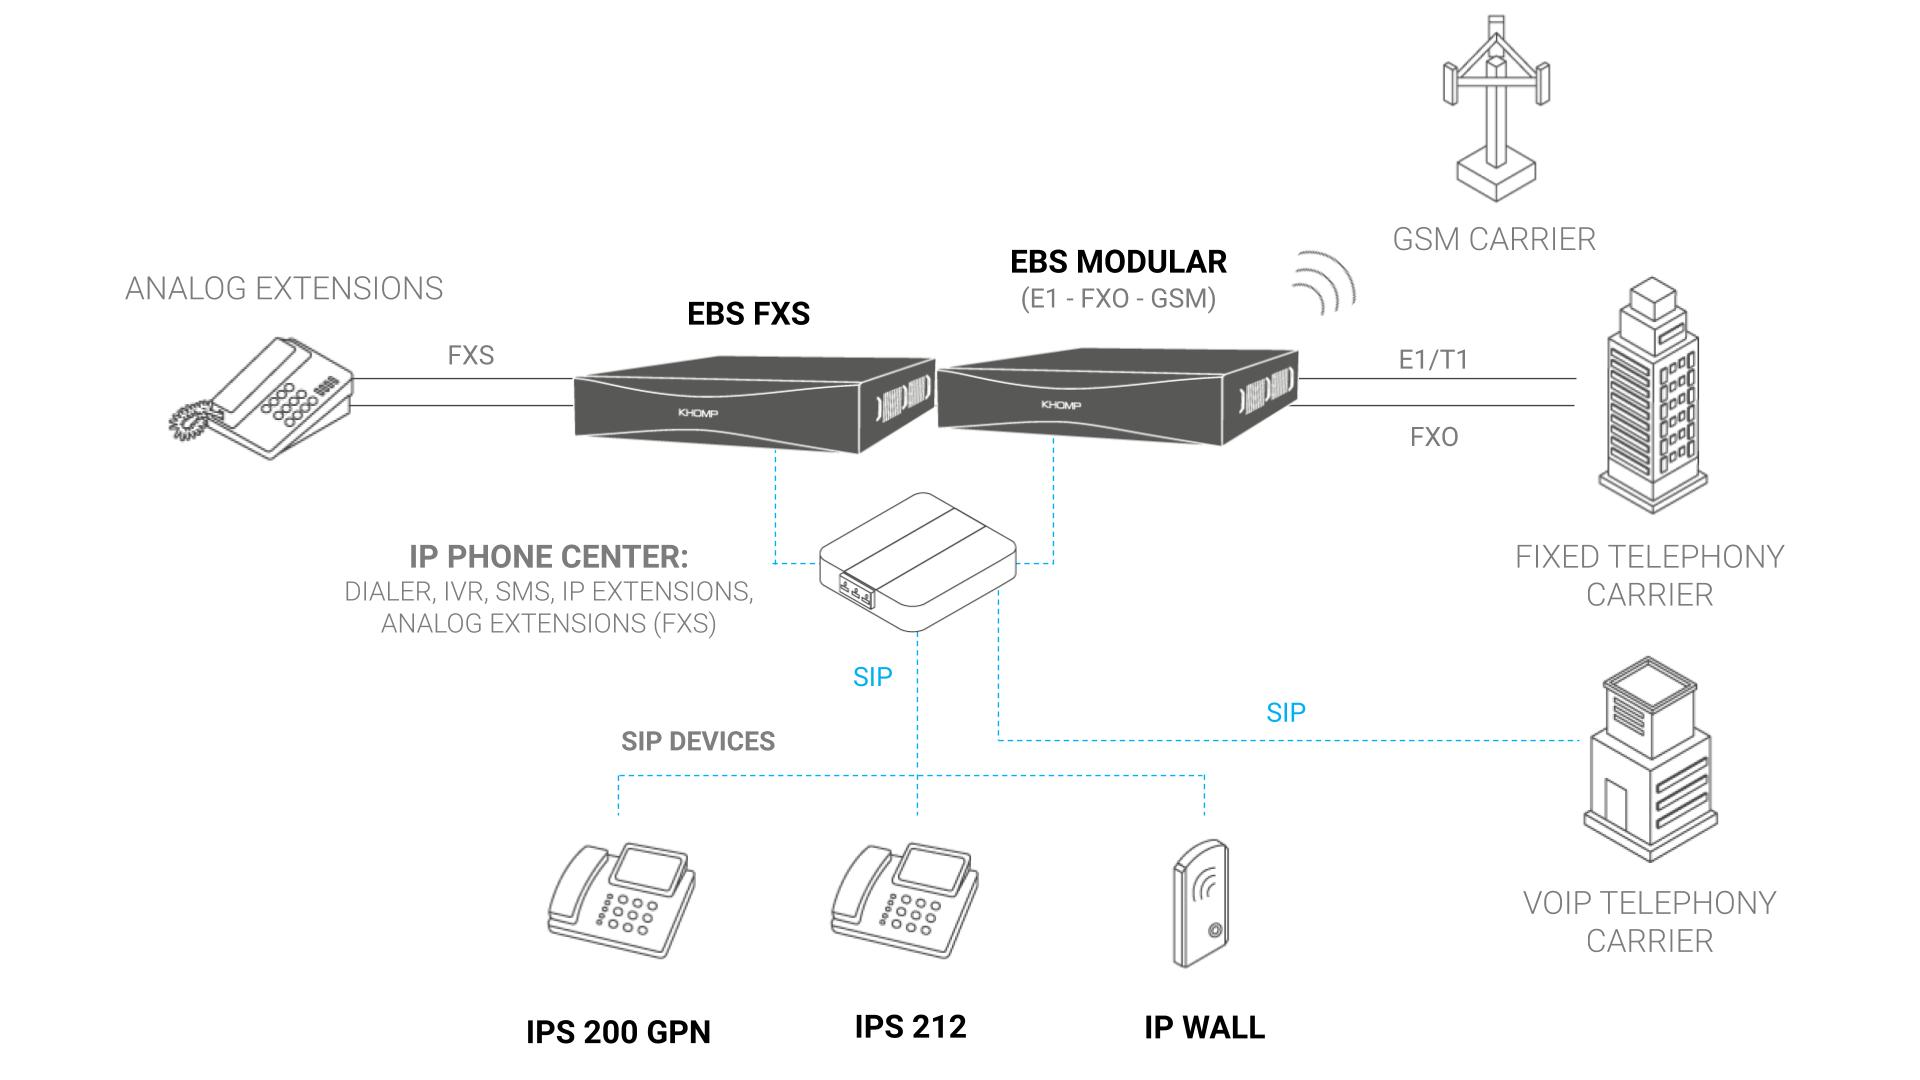 Application Model - EBS Modular